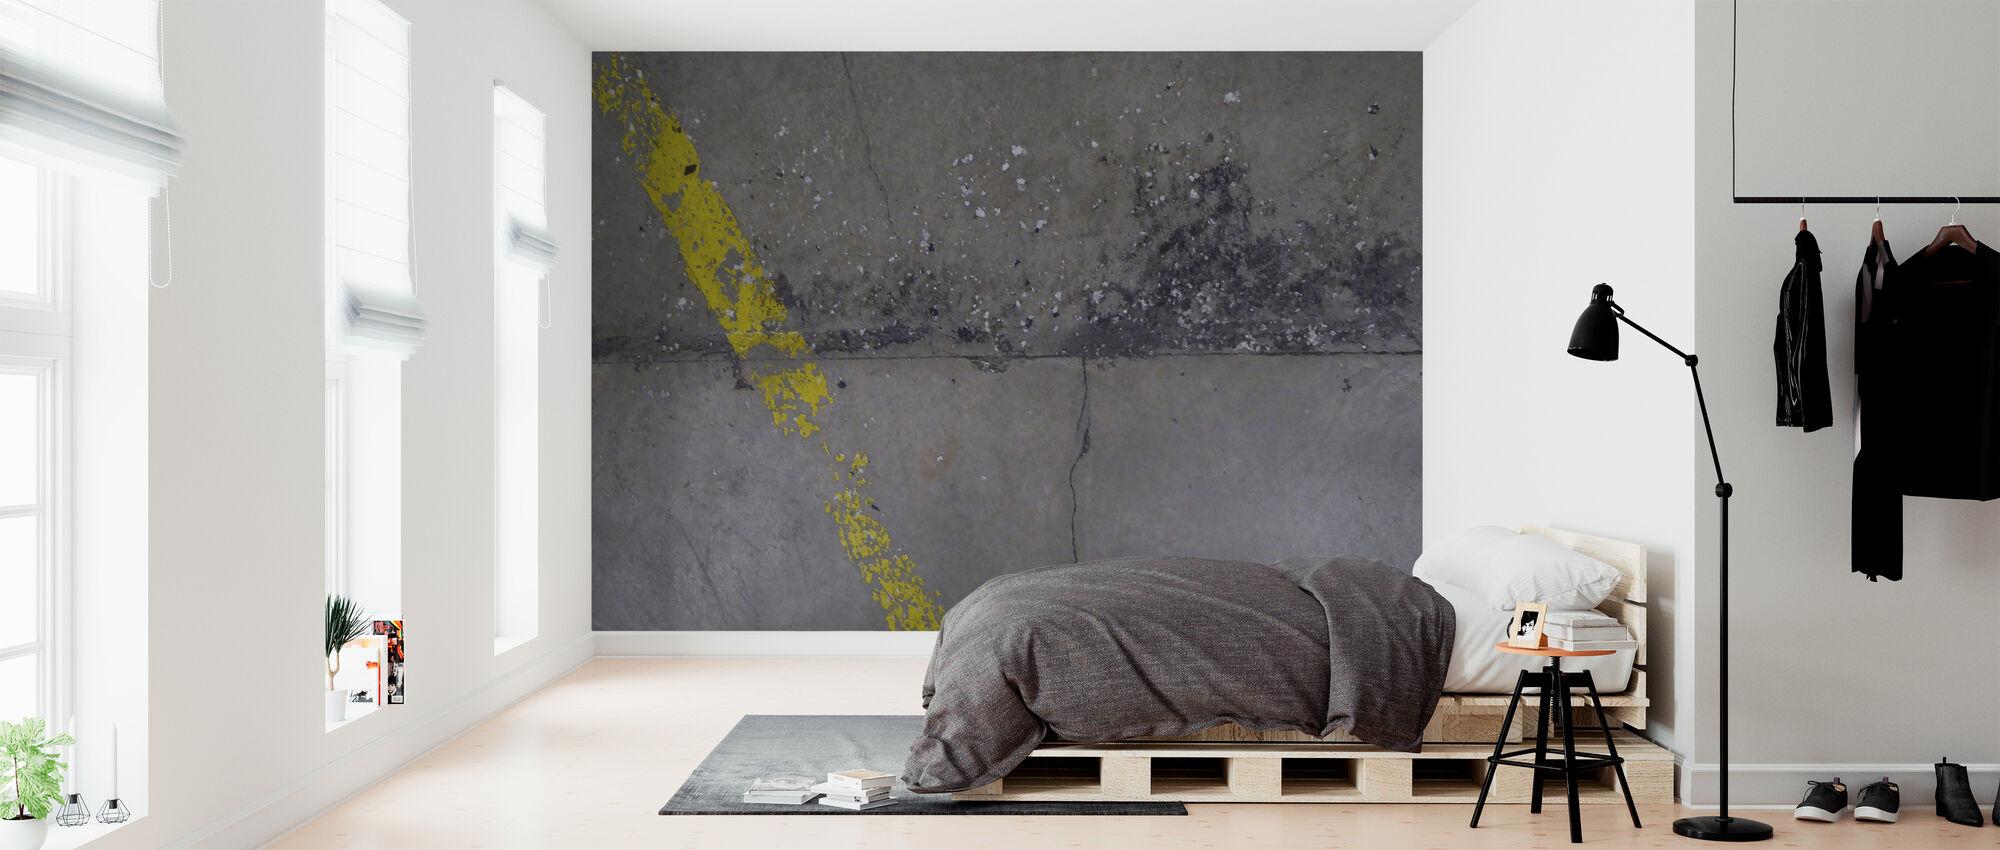 Betongulv på væg 1 - Tapet - Soveværelse